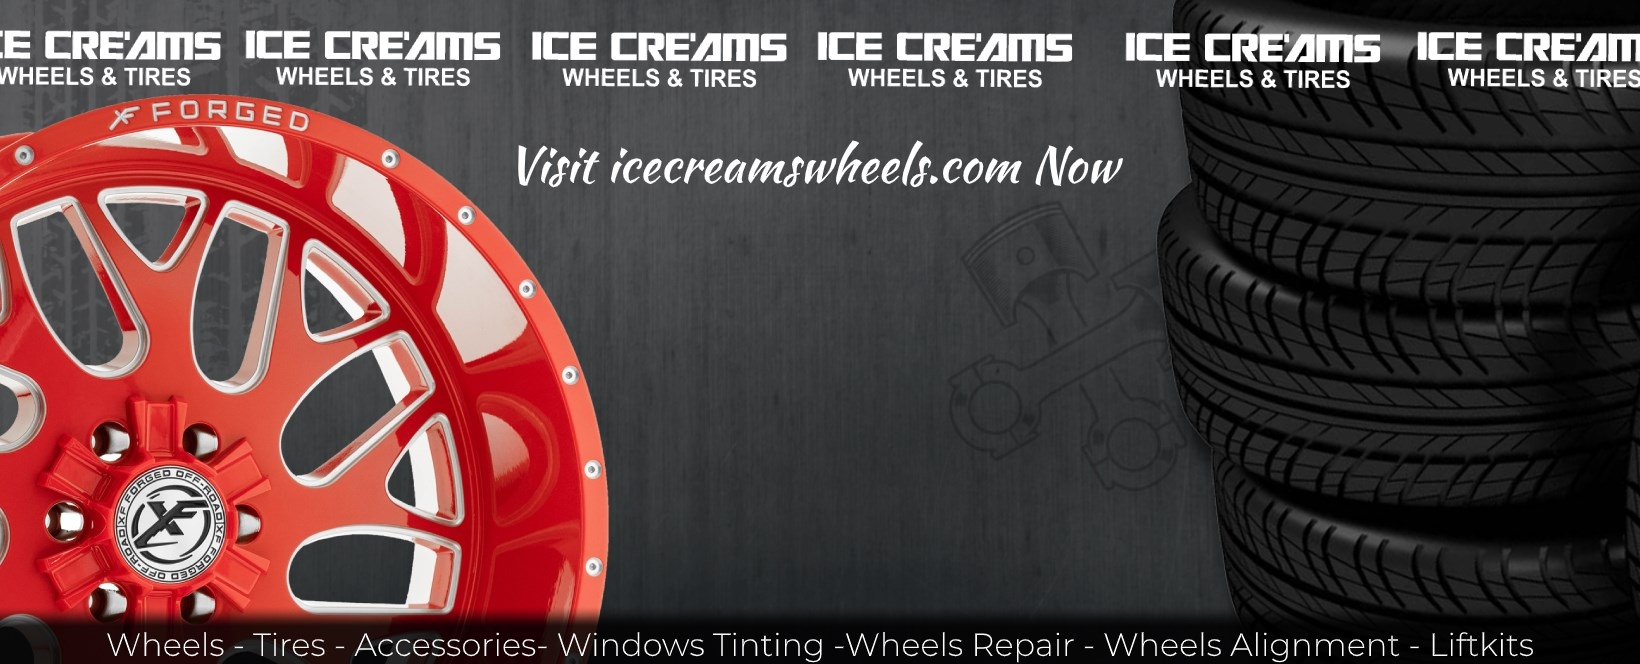 Ice Creams Wheels And Tires (@icecreamswheels) Cover Image